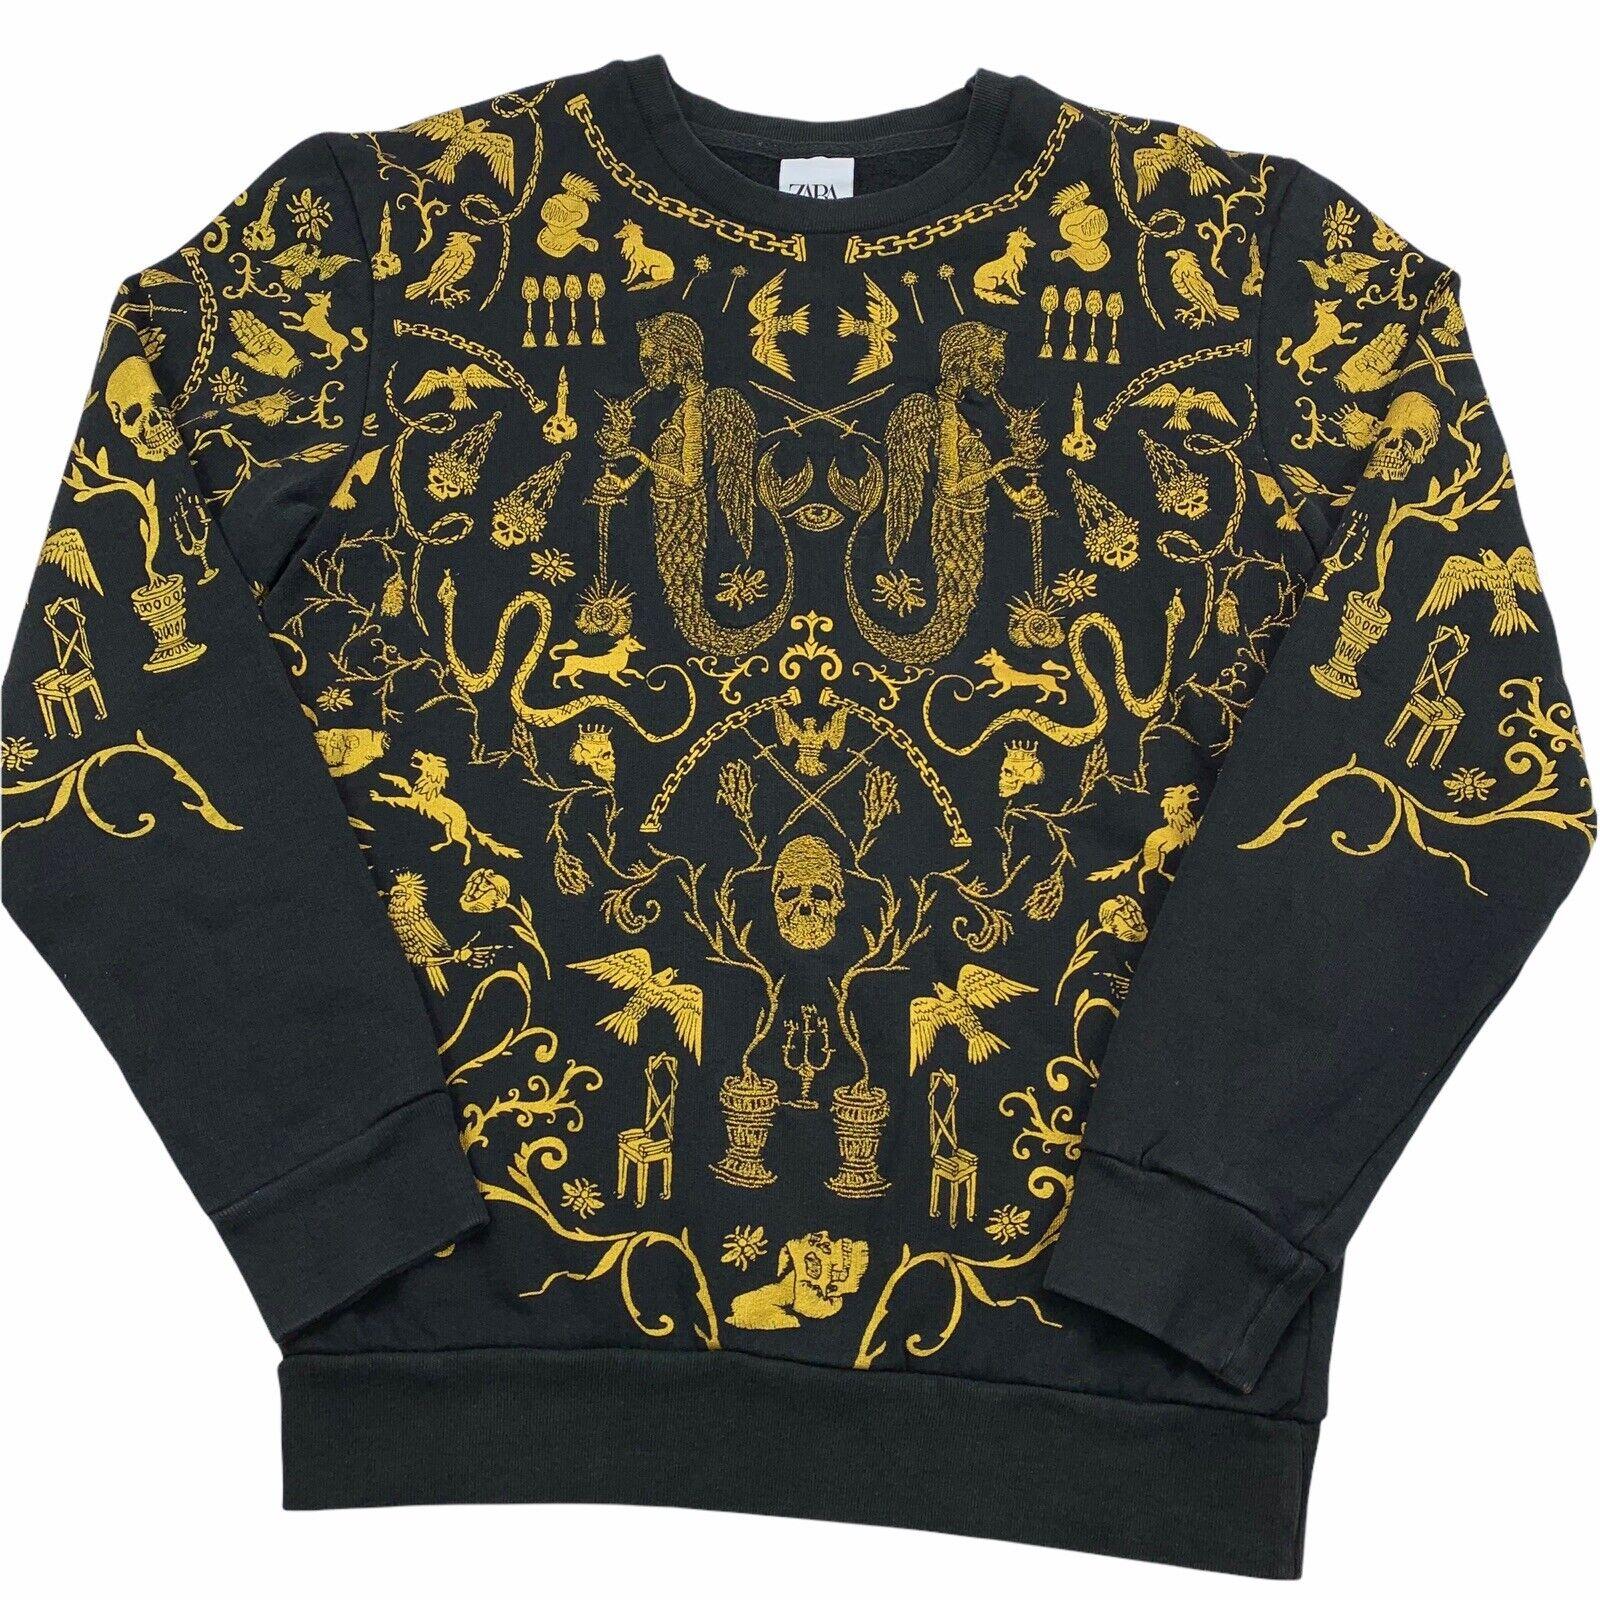 Necromancy Conjure Black Magic Witchcraft Sweatshirt Pullover Sweater Womens S